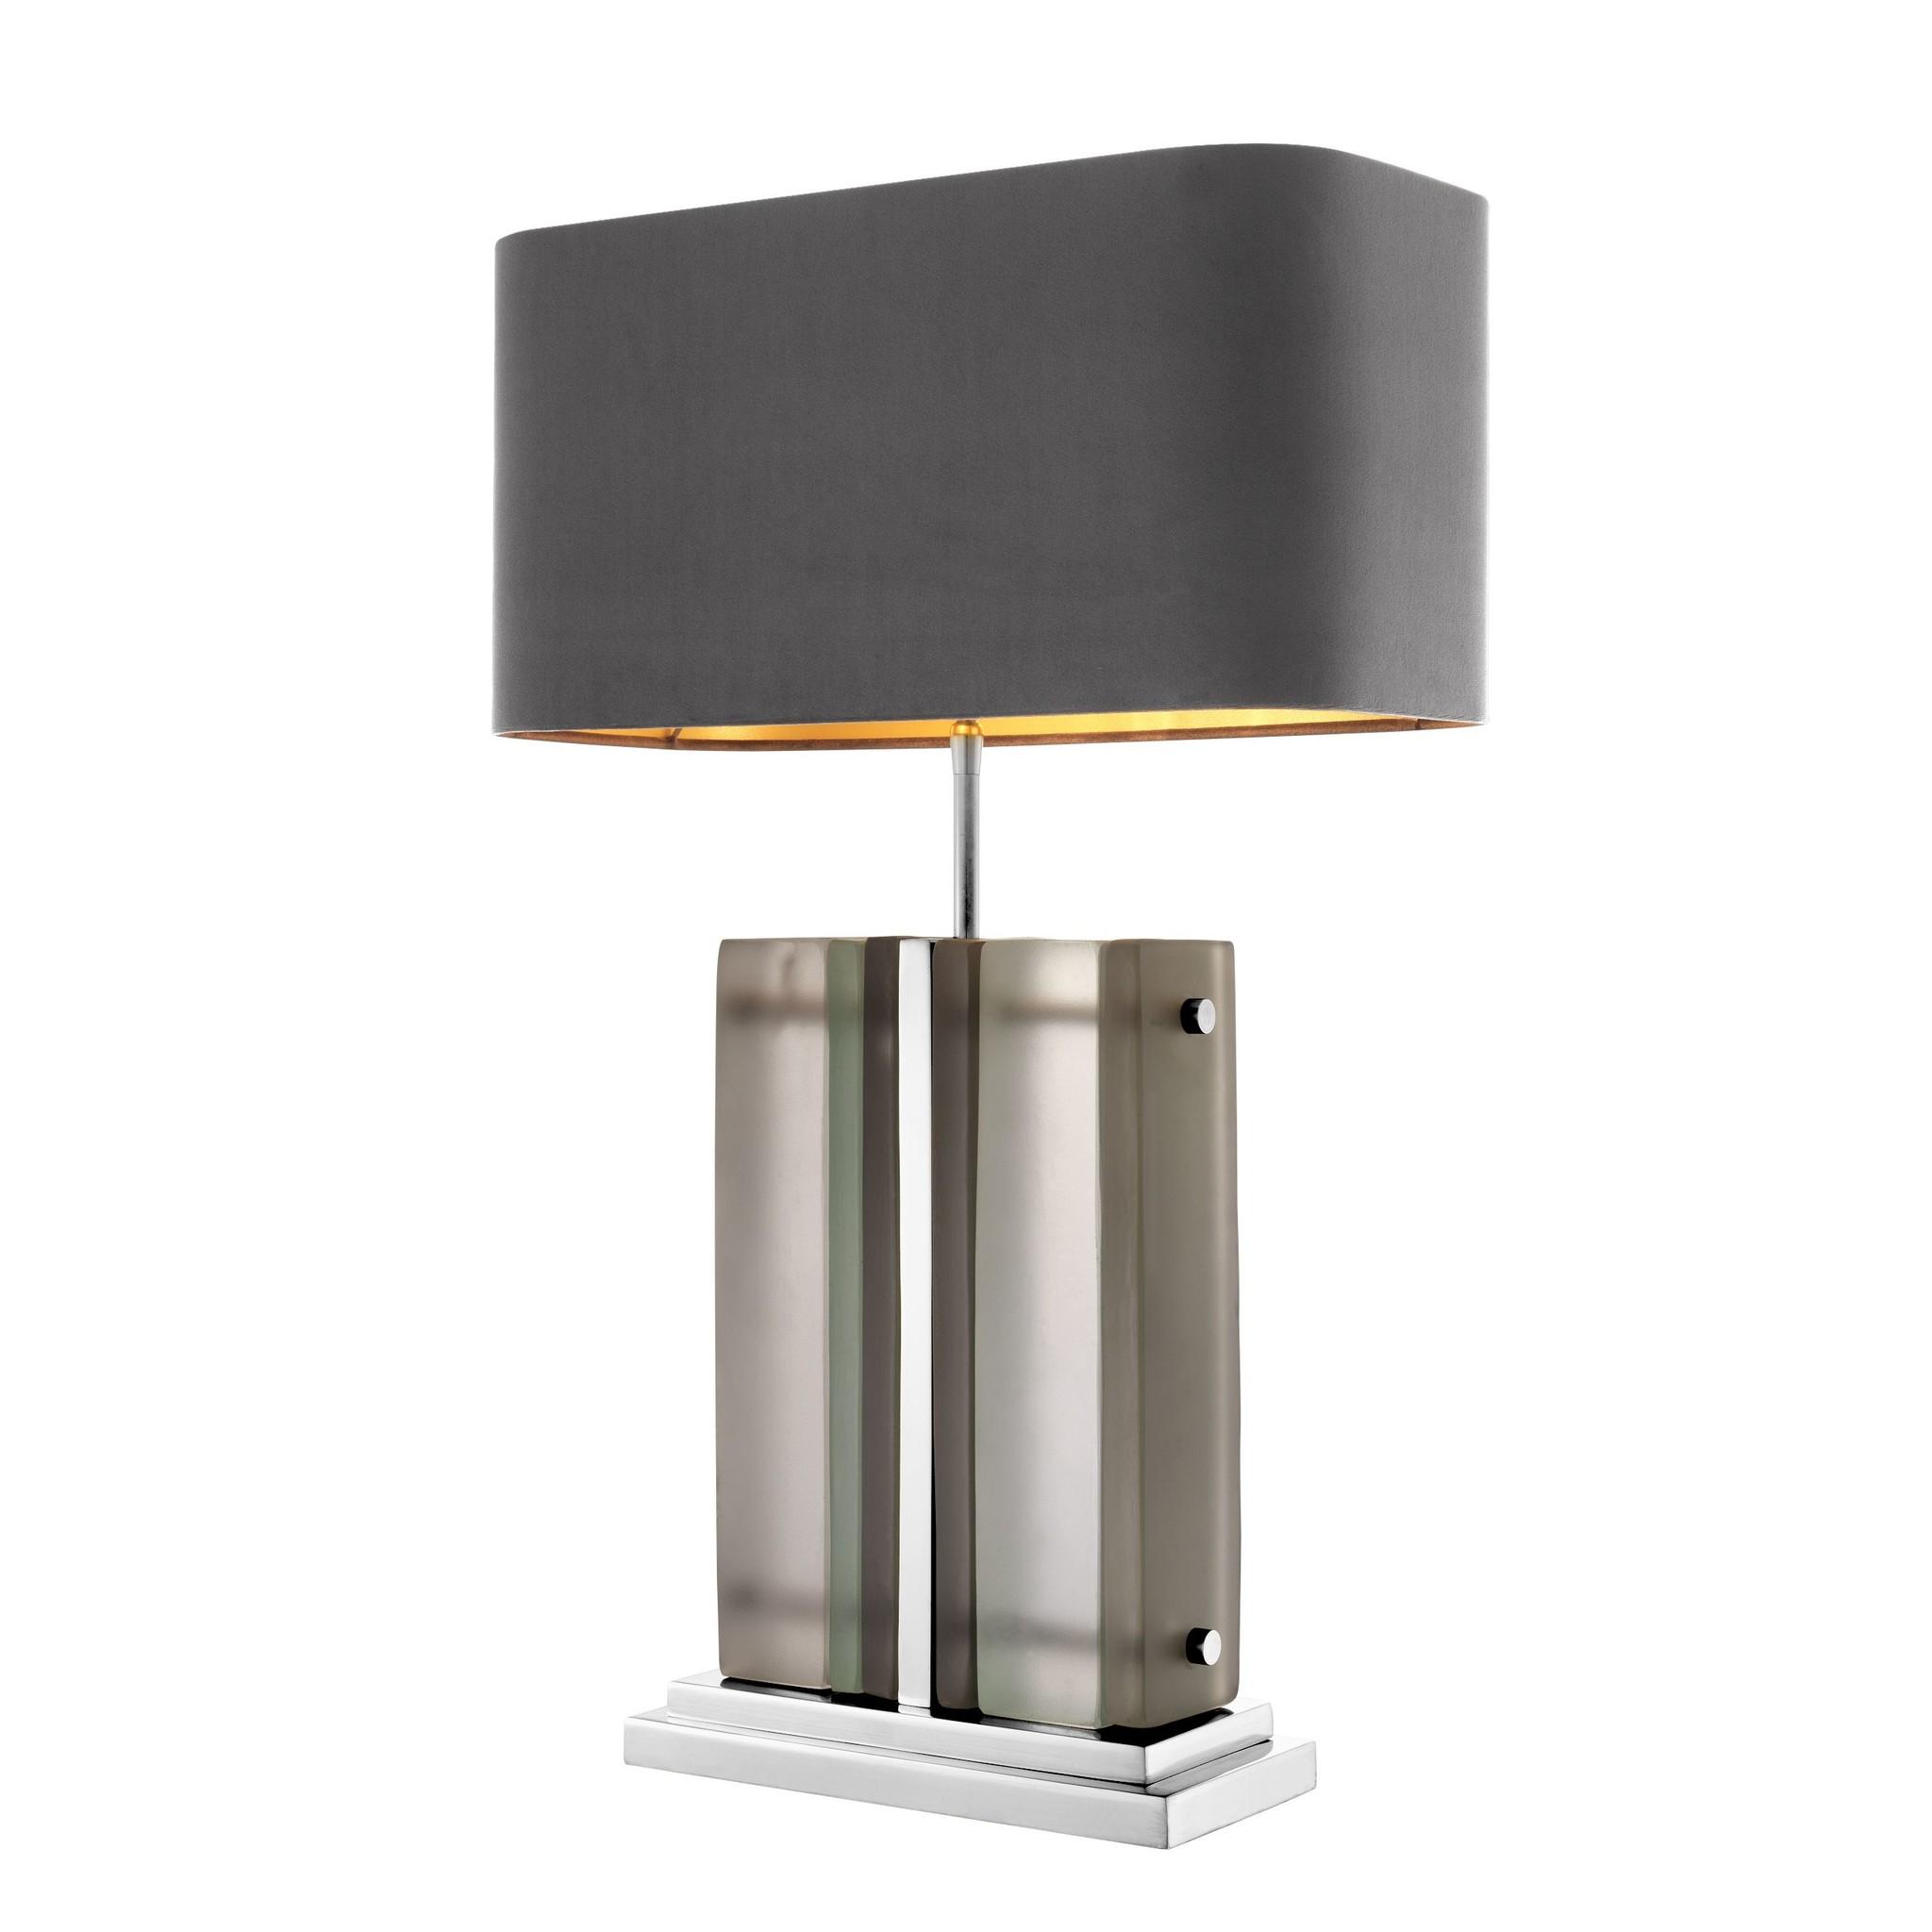 Tafellamp Solana